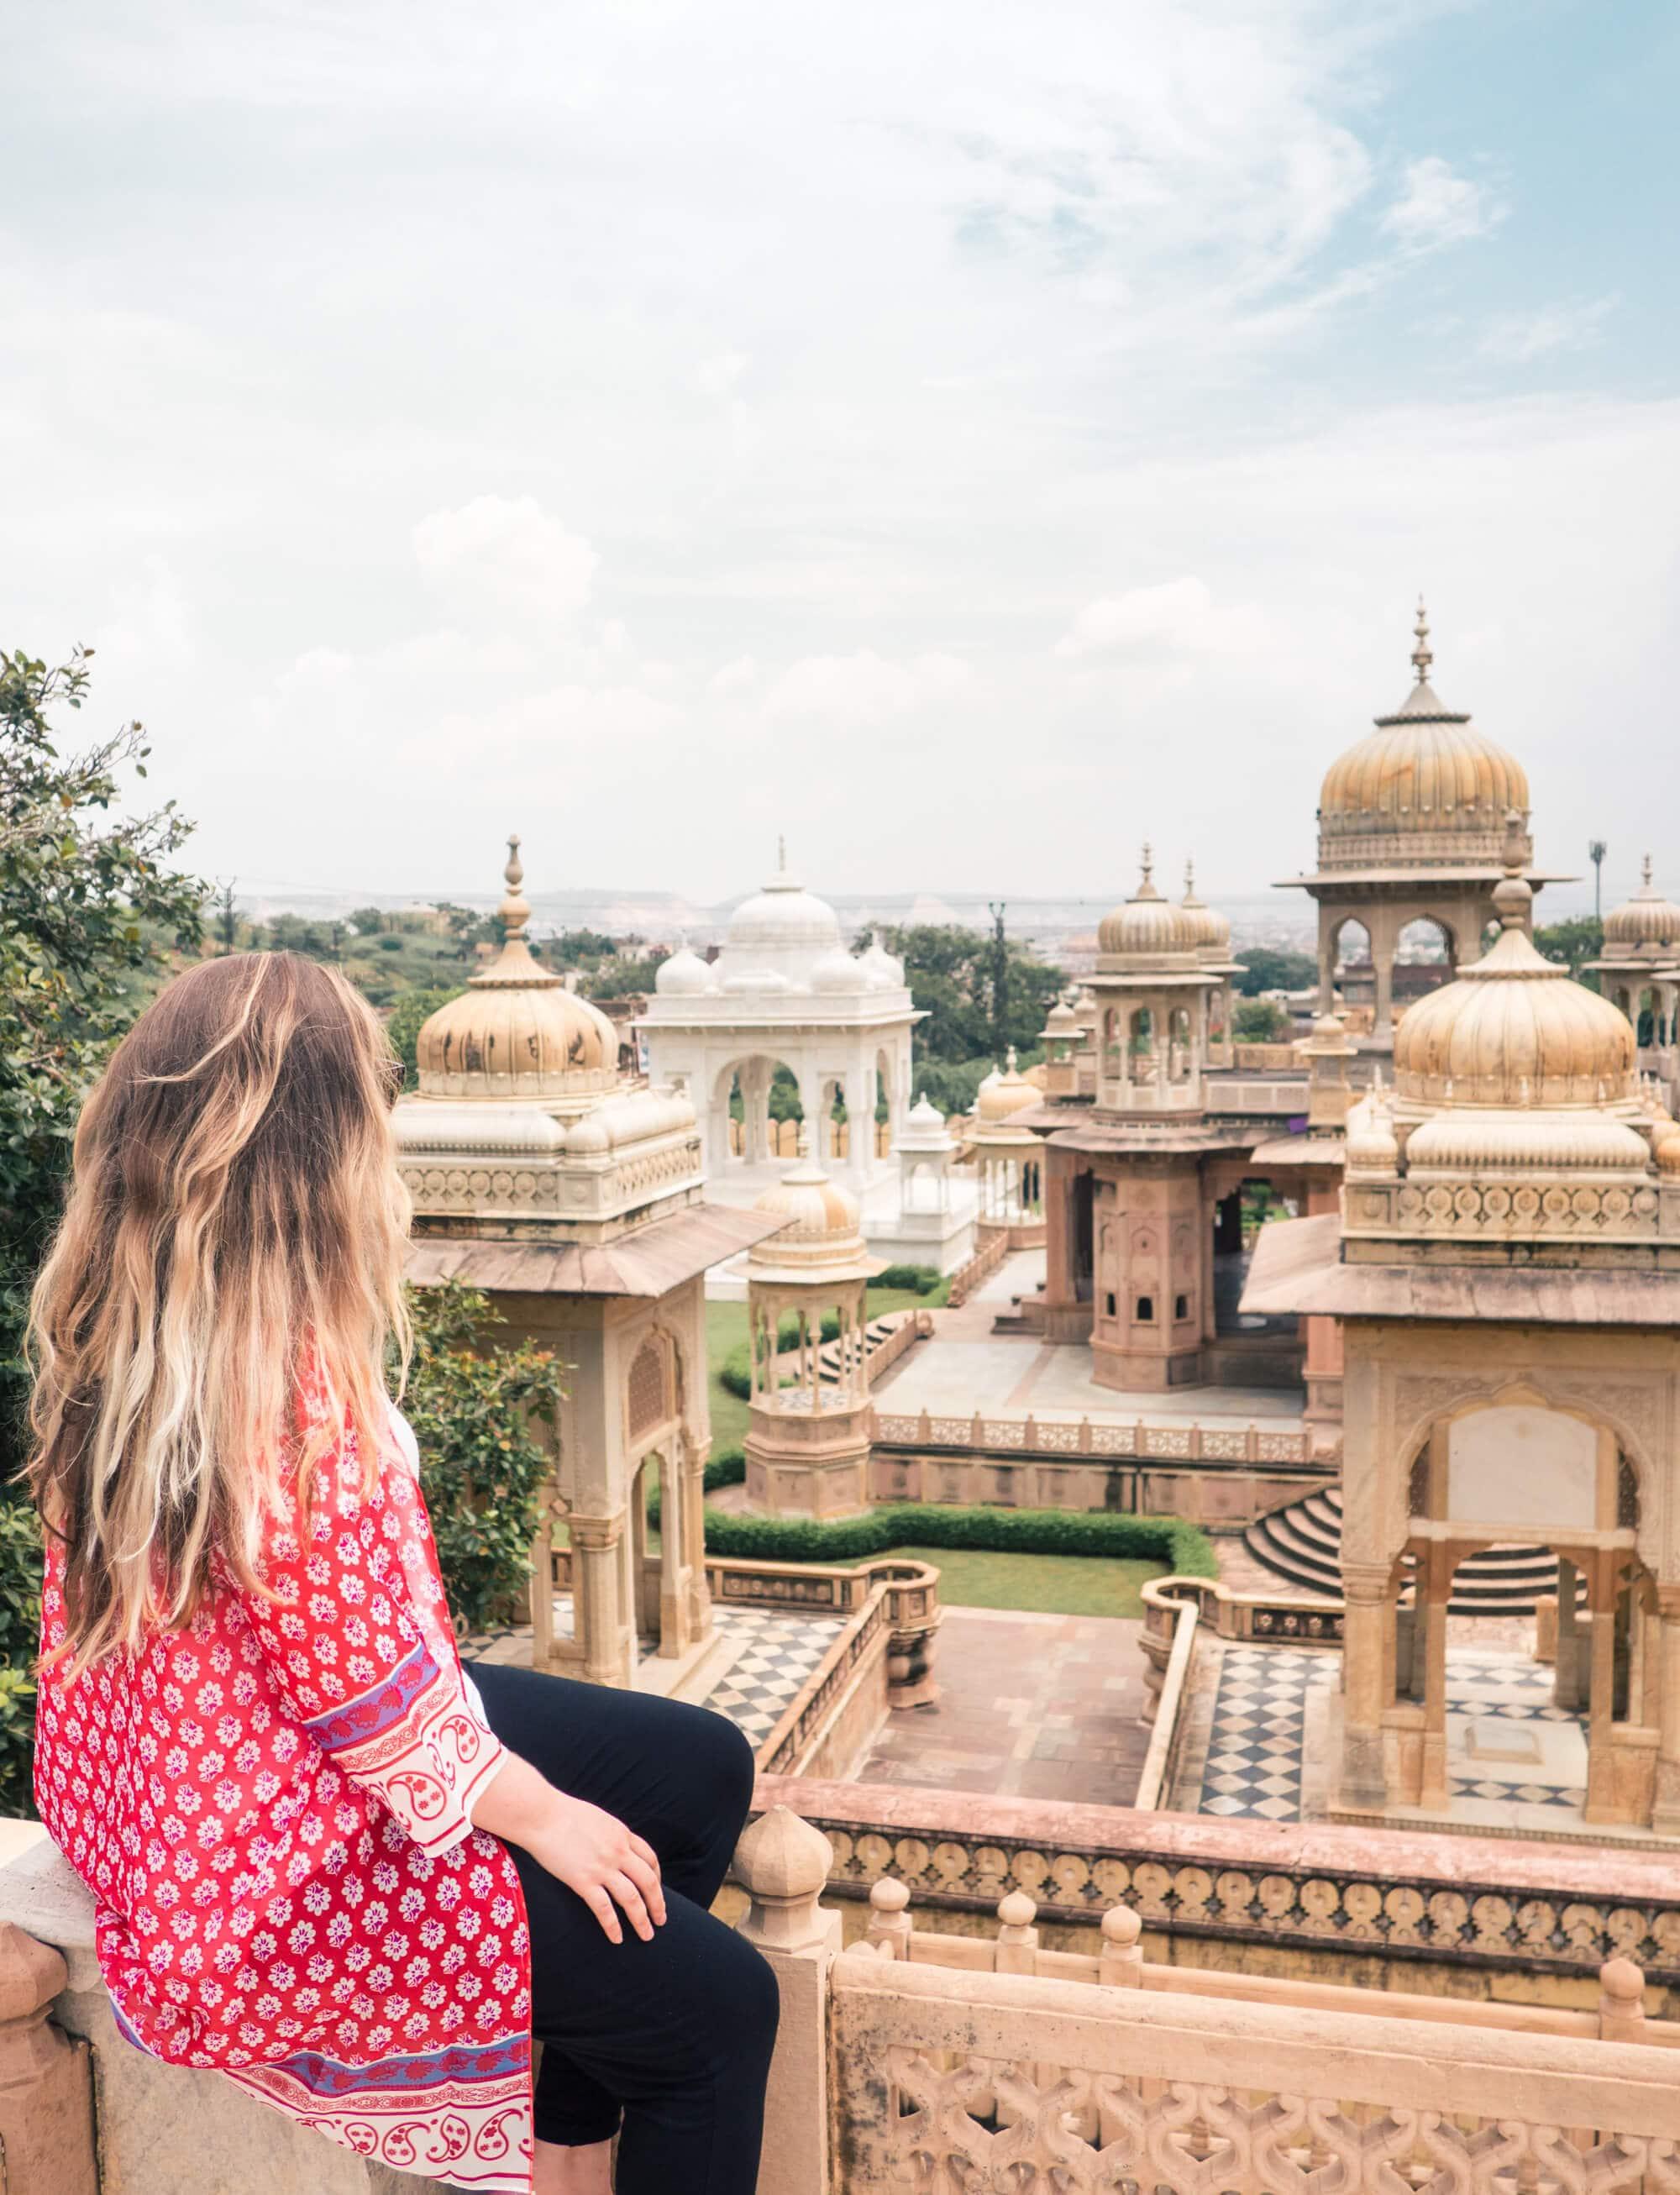 How to spend 2 days in Jaipur - Gatore Ki Chatriyan